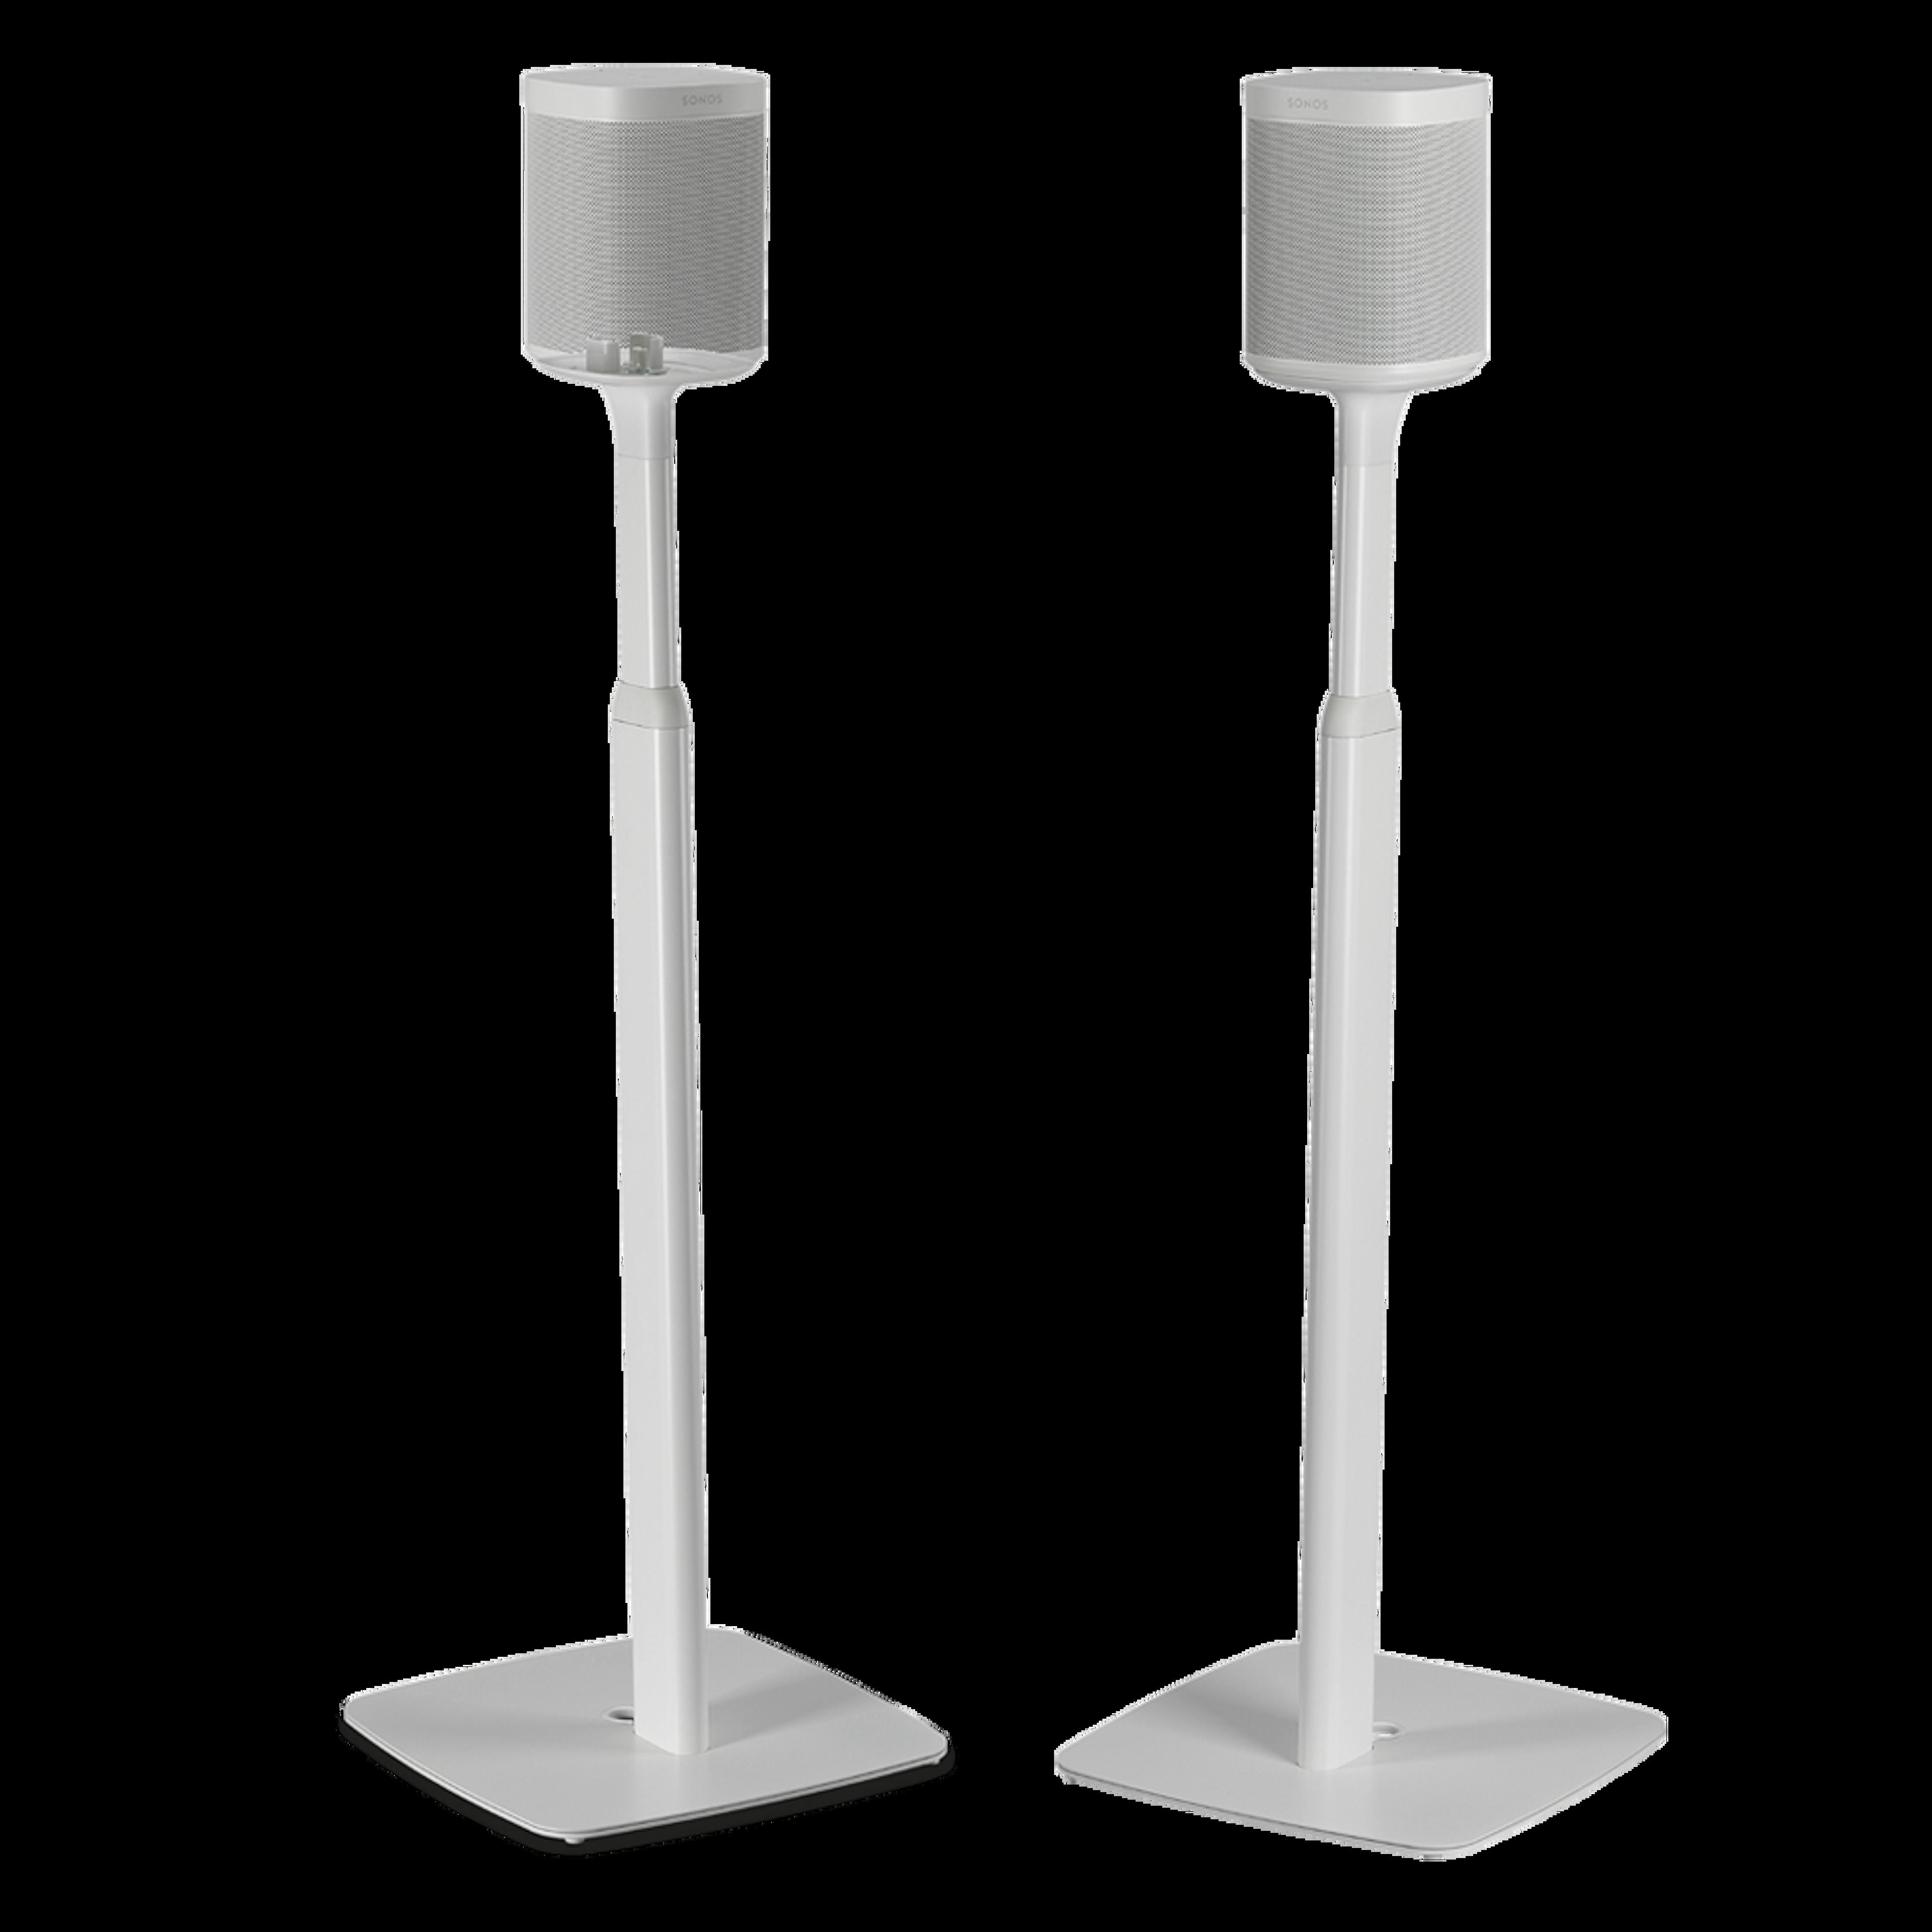 Flexson Adjustable Floor Stand (Pair) white